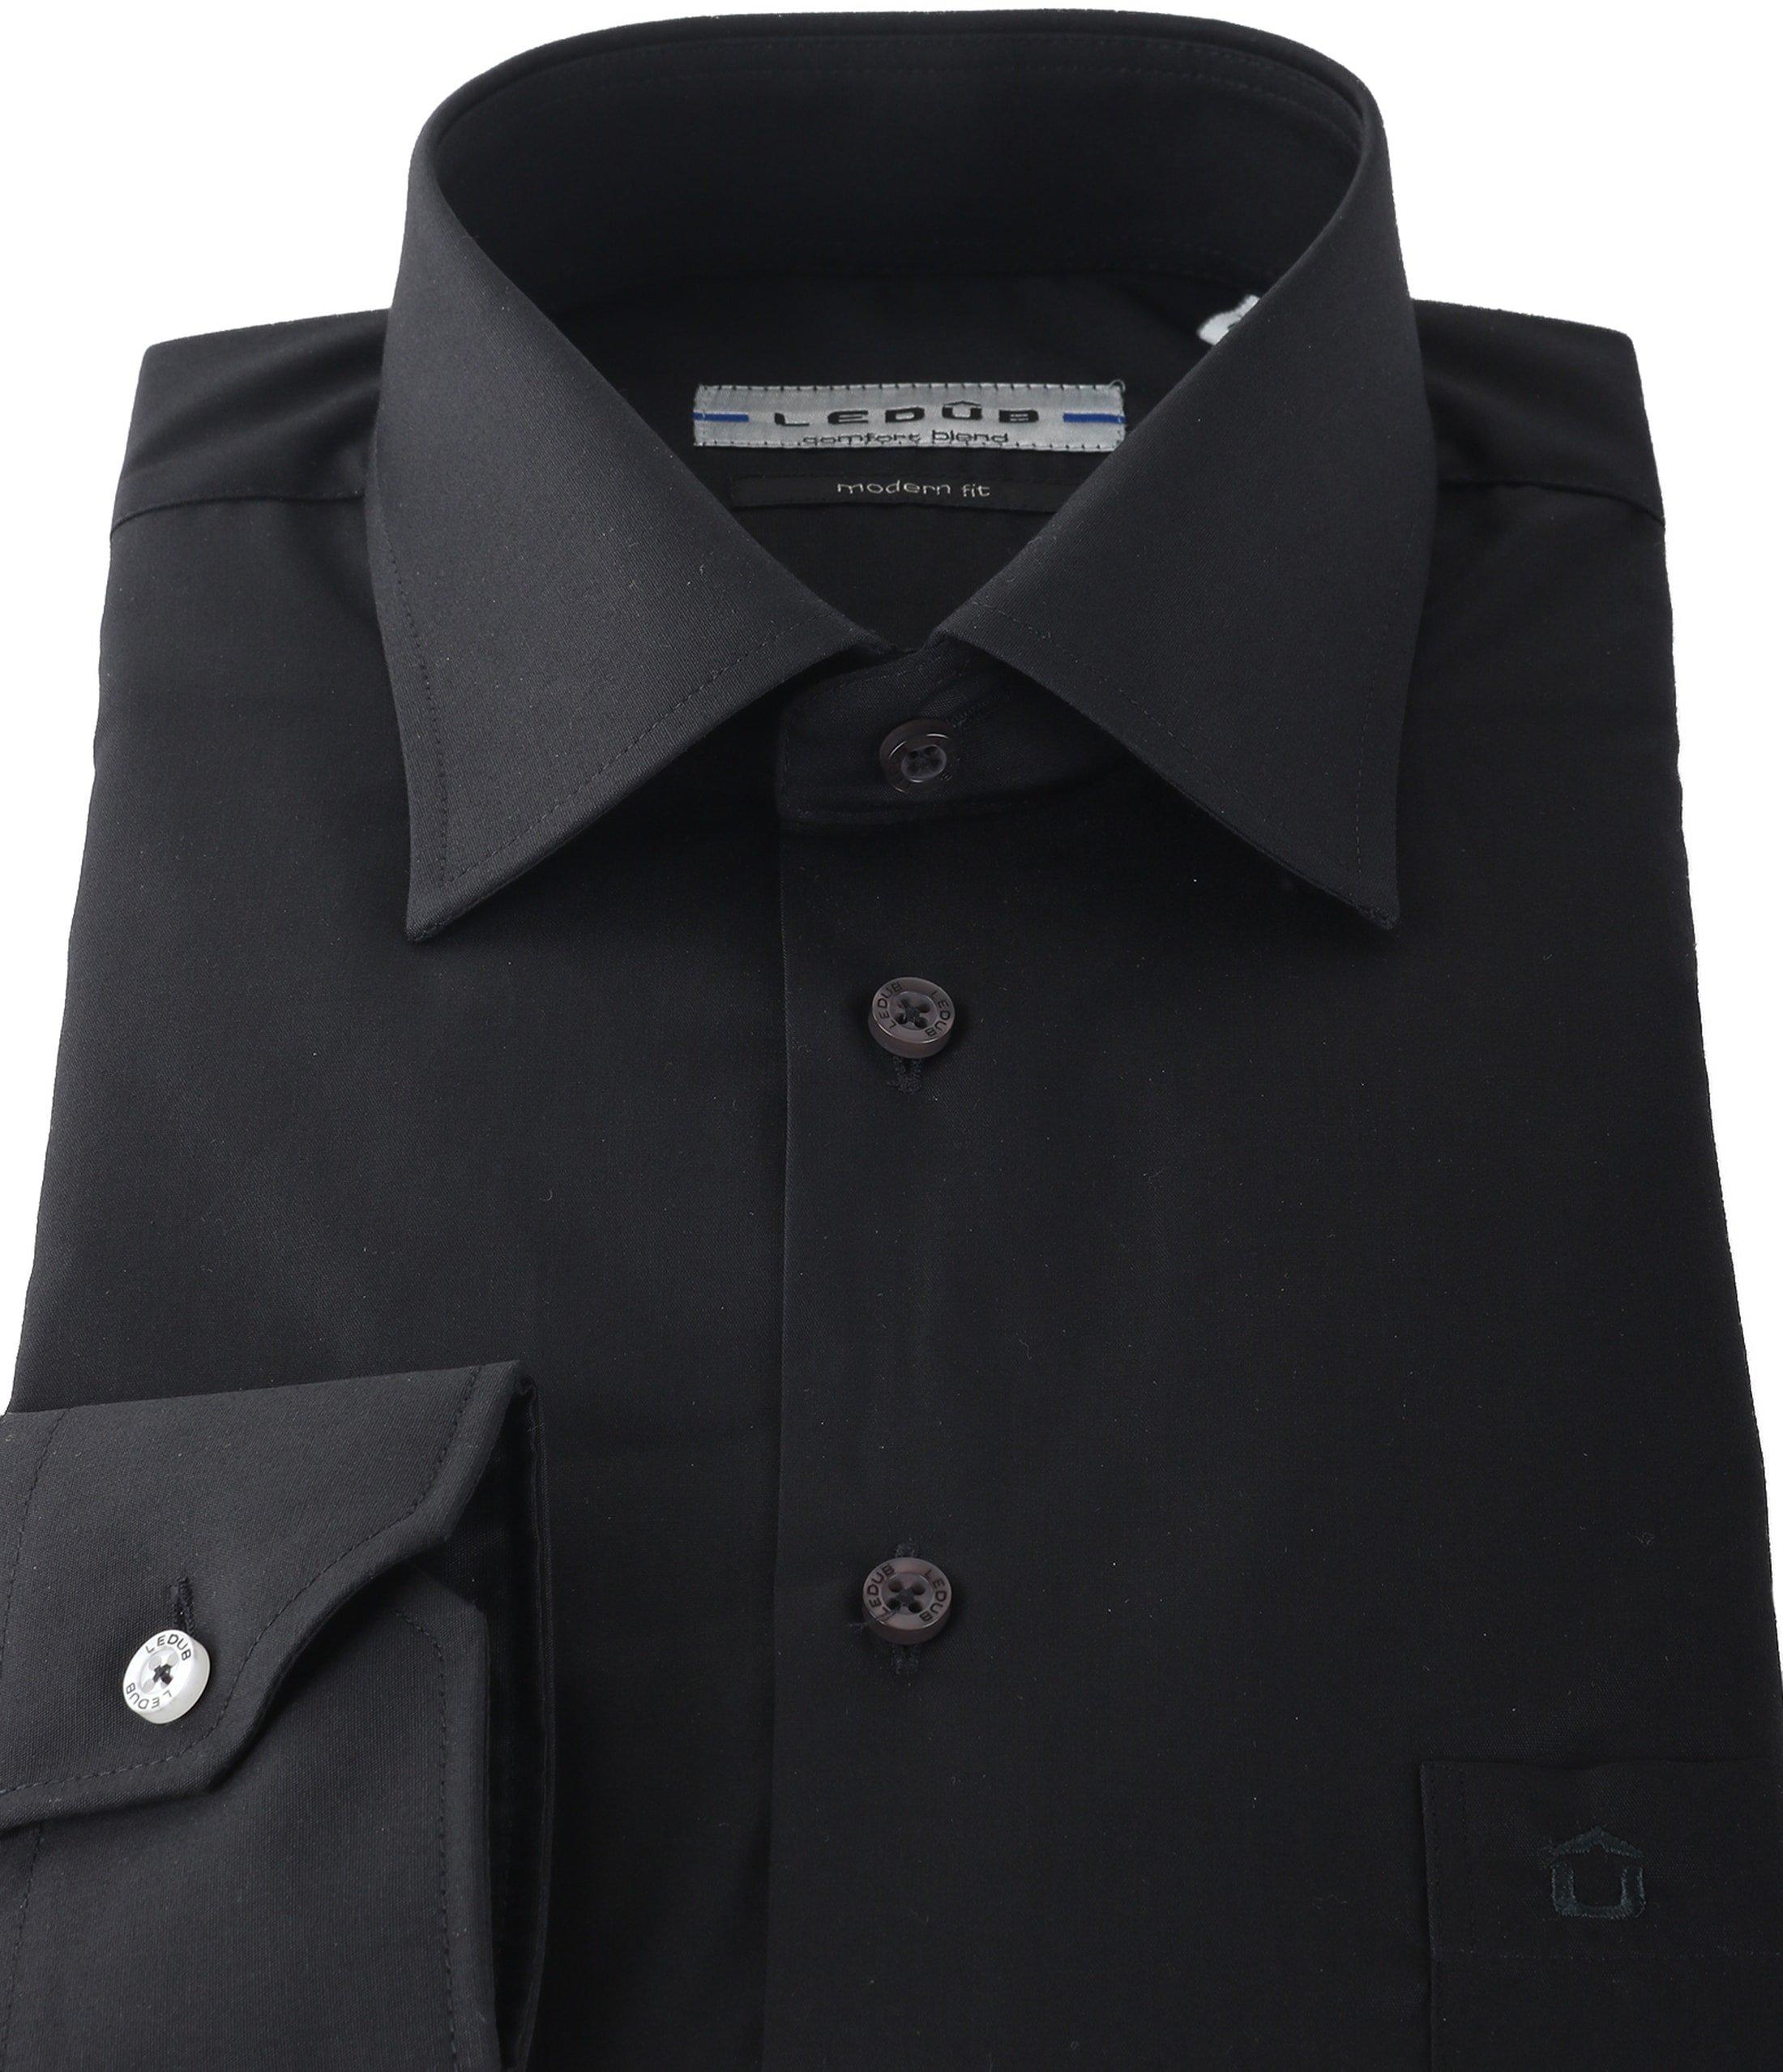 Ledub Overhemd Zwart Modern Fit foto 1